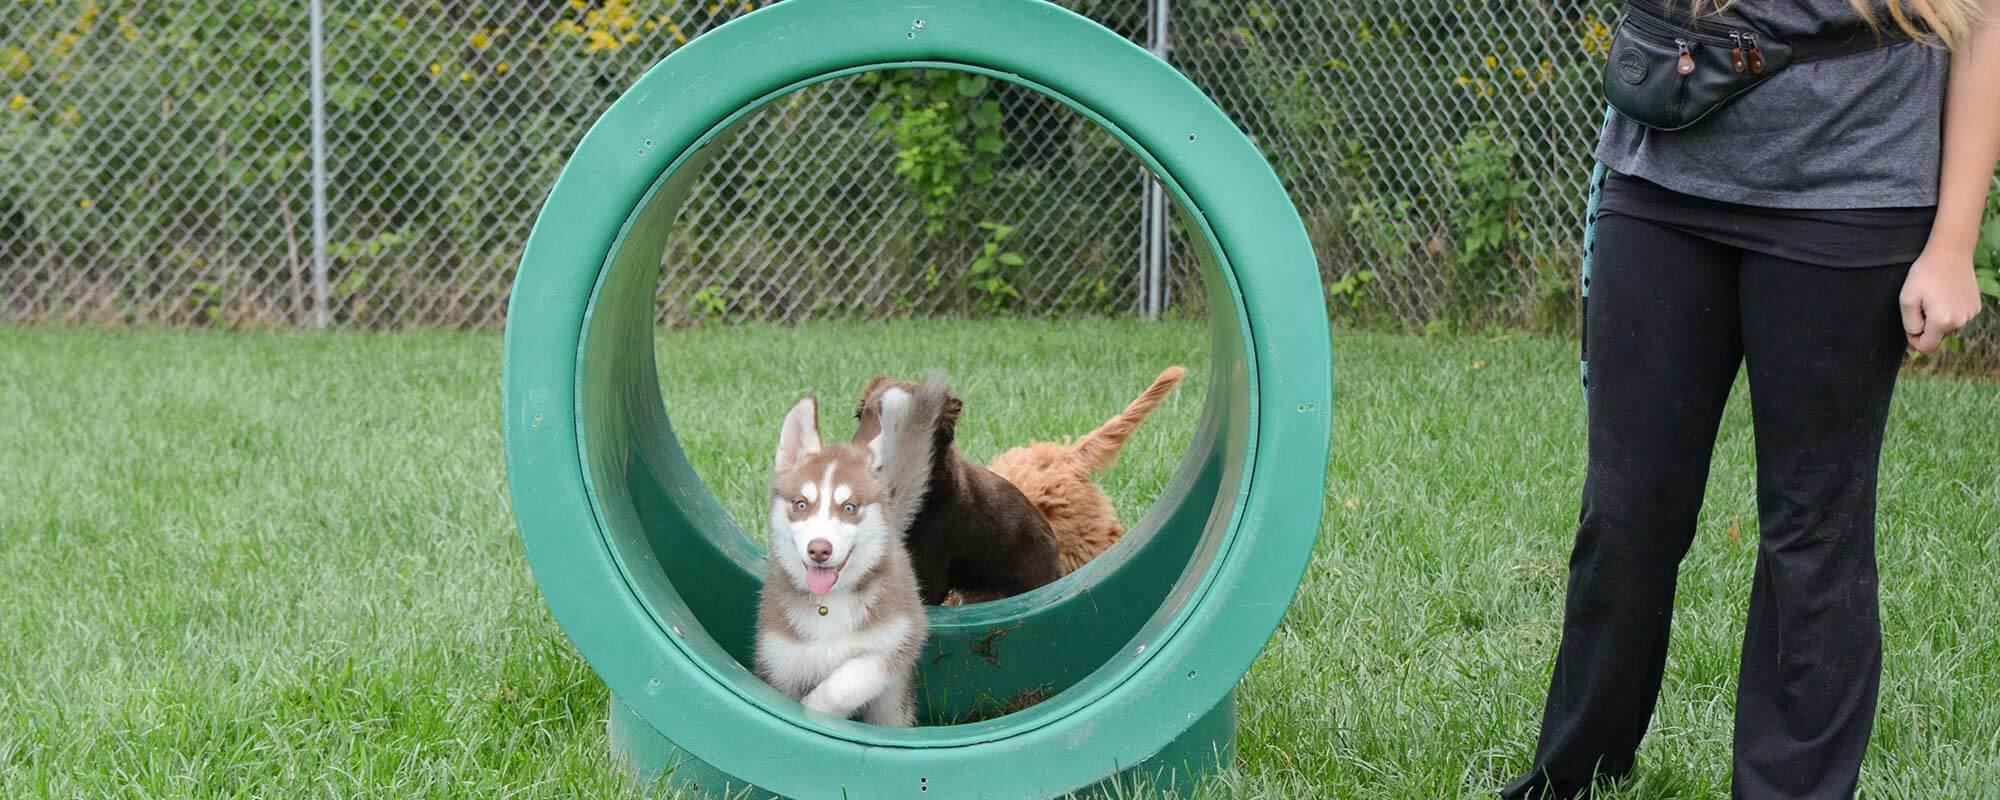 Pet Care Videos Zimmerman Mn Veterinarian Zimmerman Veterinary Clinic